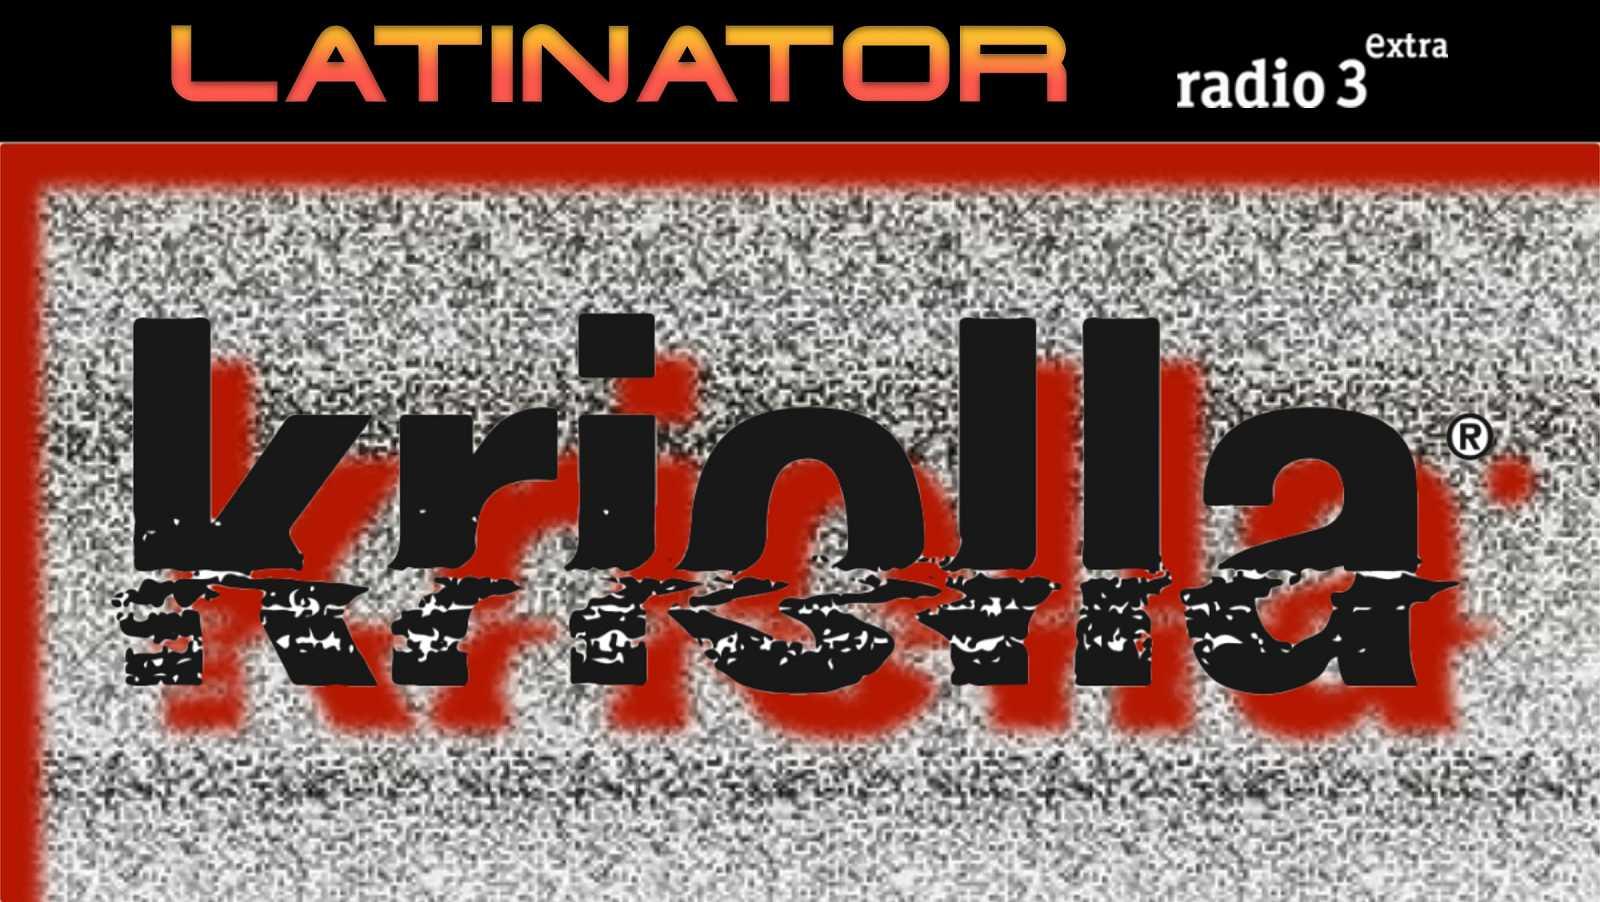 Latinator - KRIOLLA - 21/05/20 - escuchar ahora